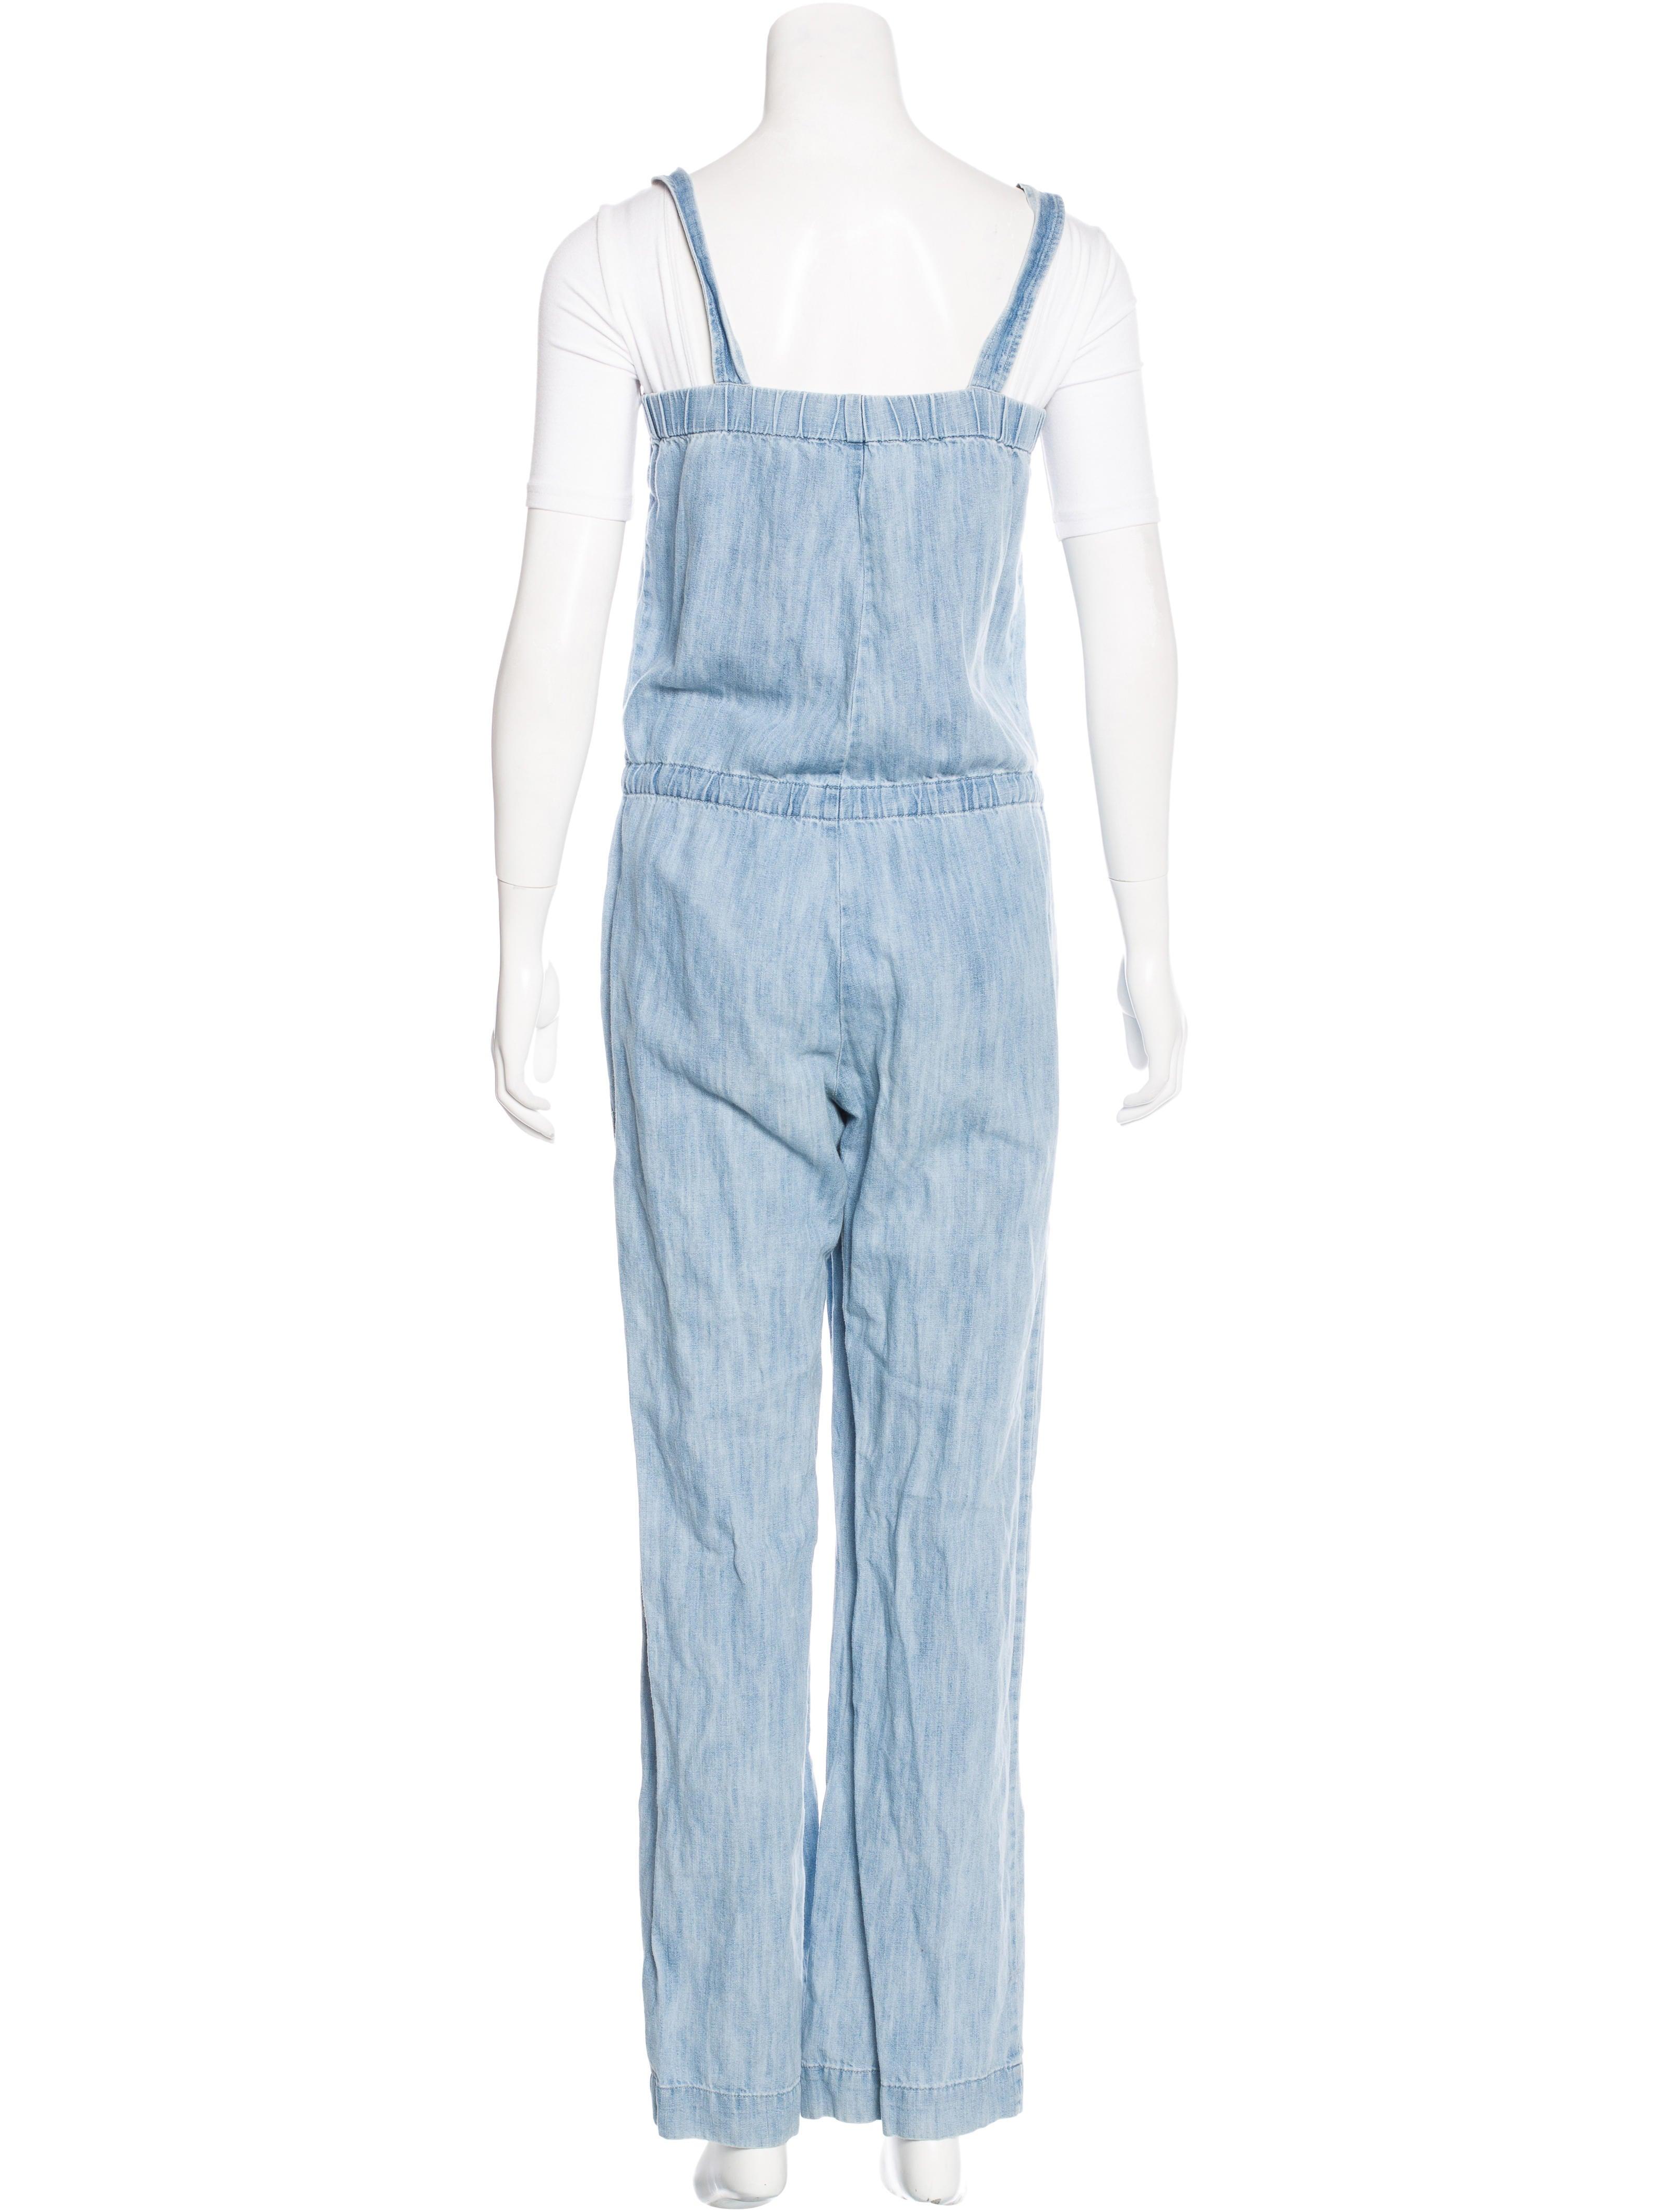 apc sleeveless denim jumpsuit clothing wa324641